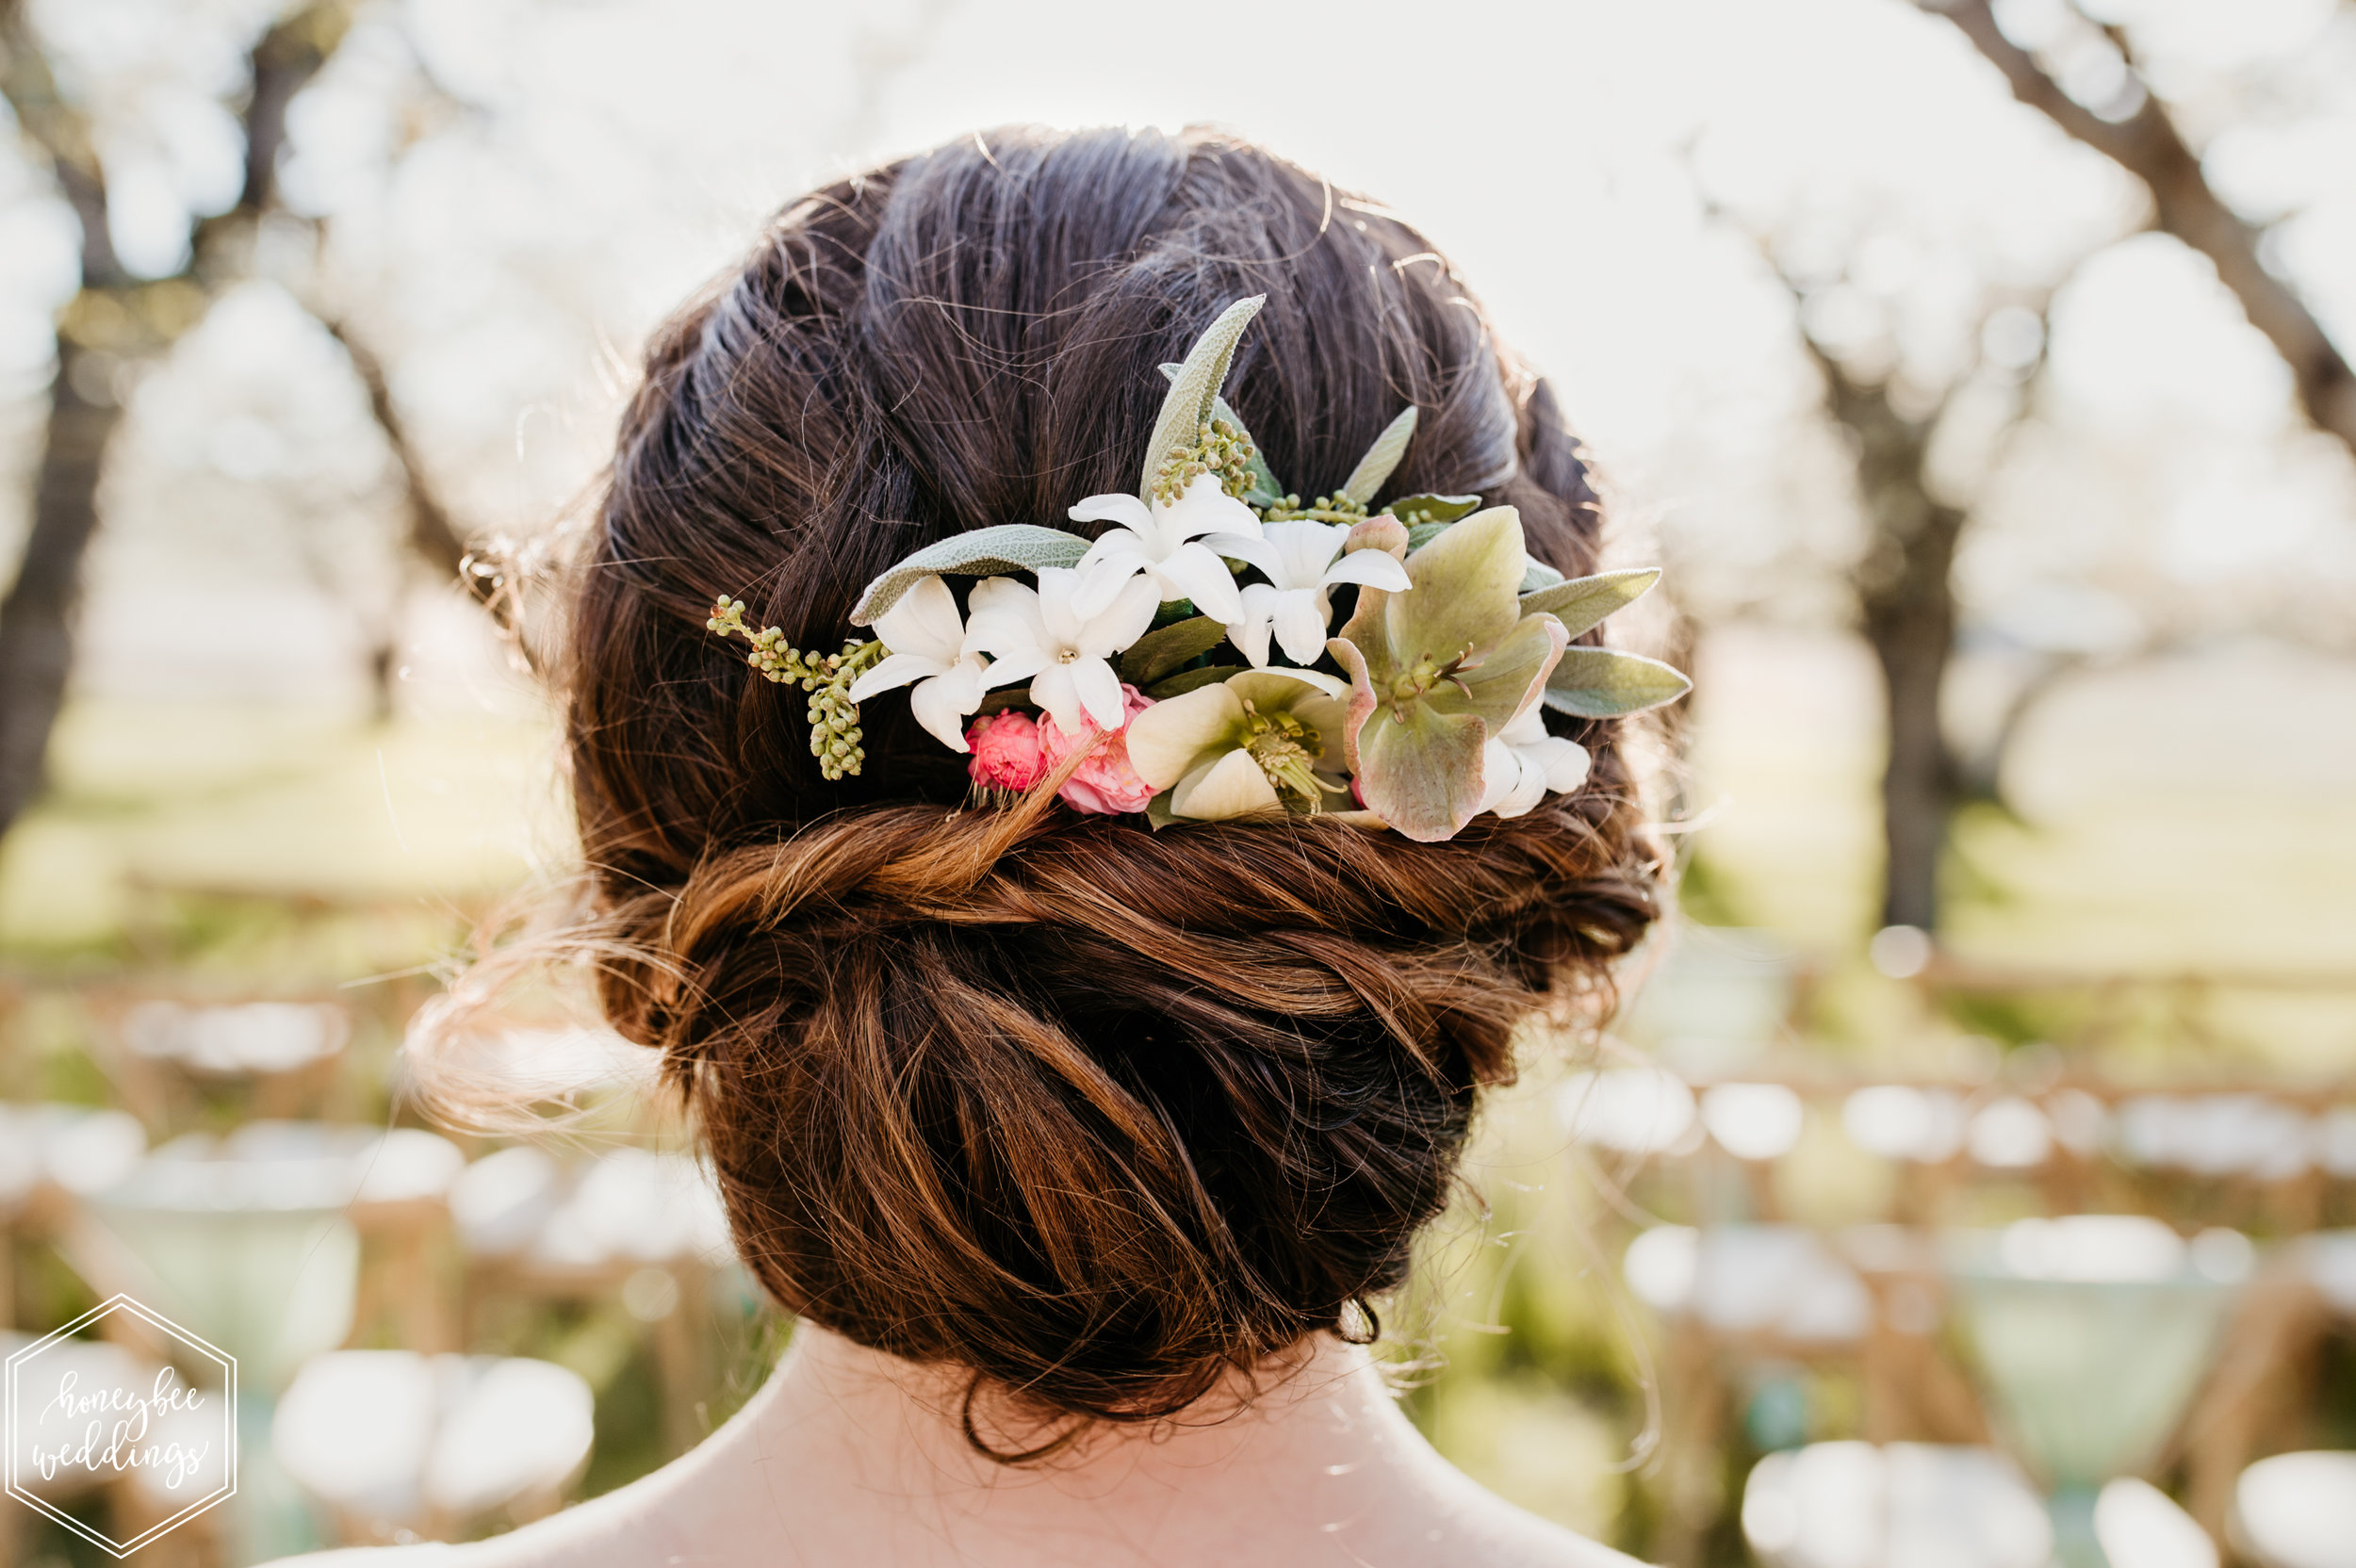 073Cherry Blossom Wedding_Styled Photoshoot_Honeybee Weddings_May 11, 2019-123.jpg